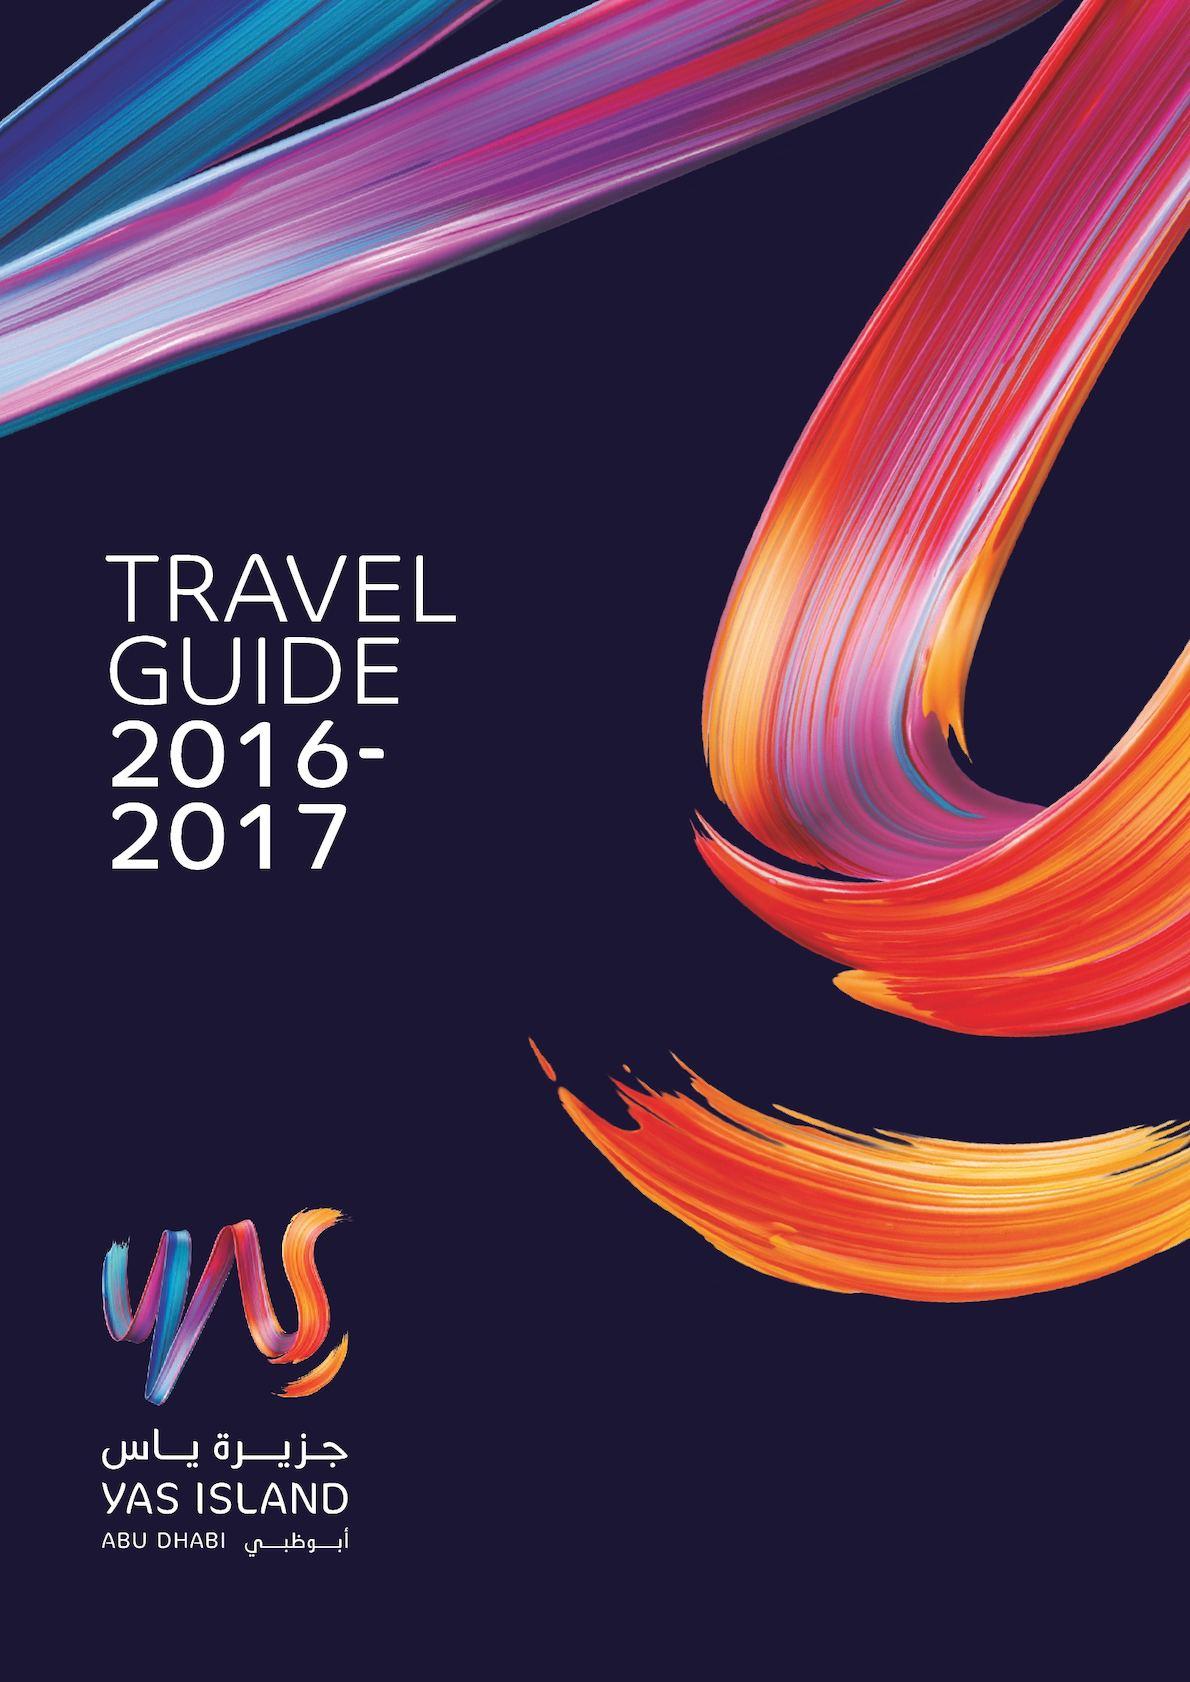 Calaméo - Travel Guide Update